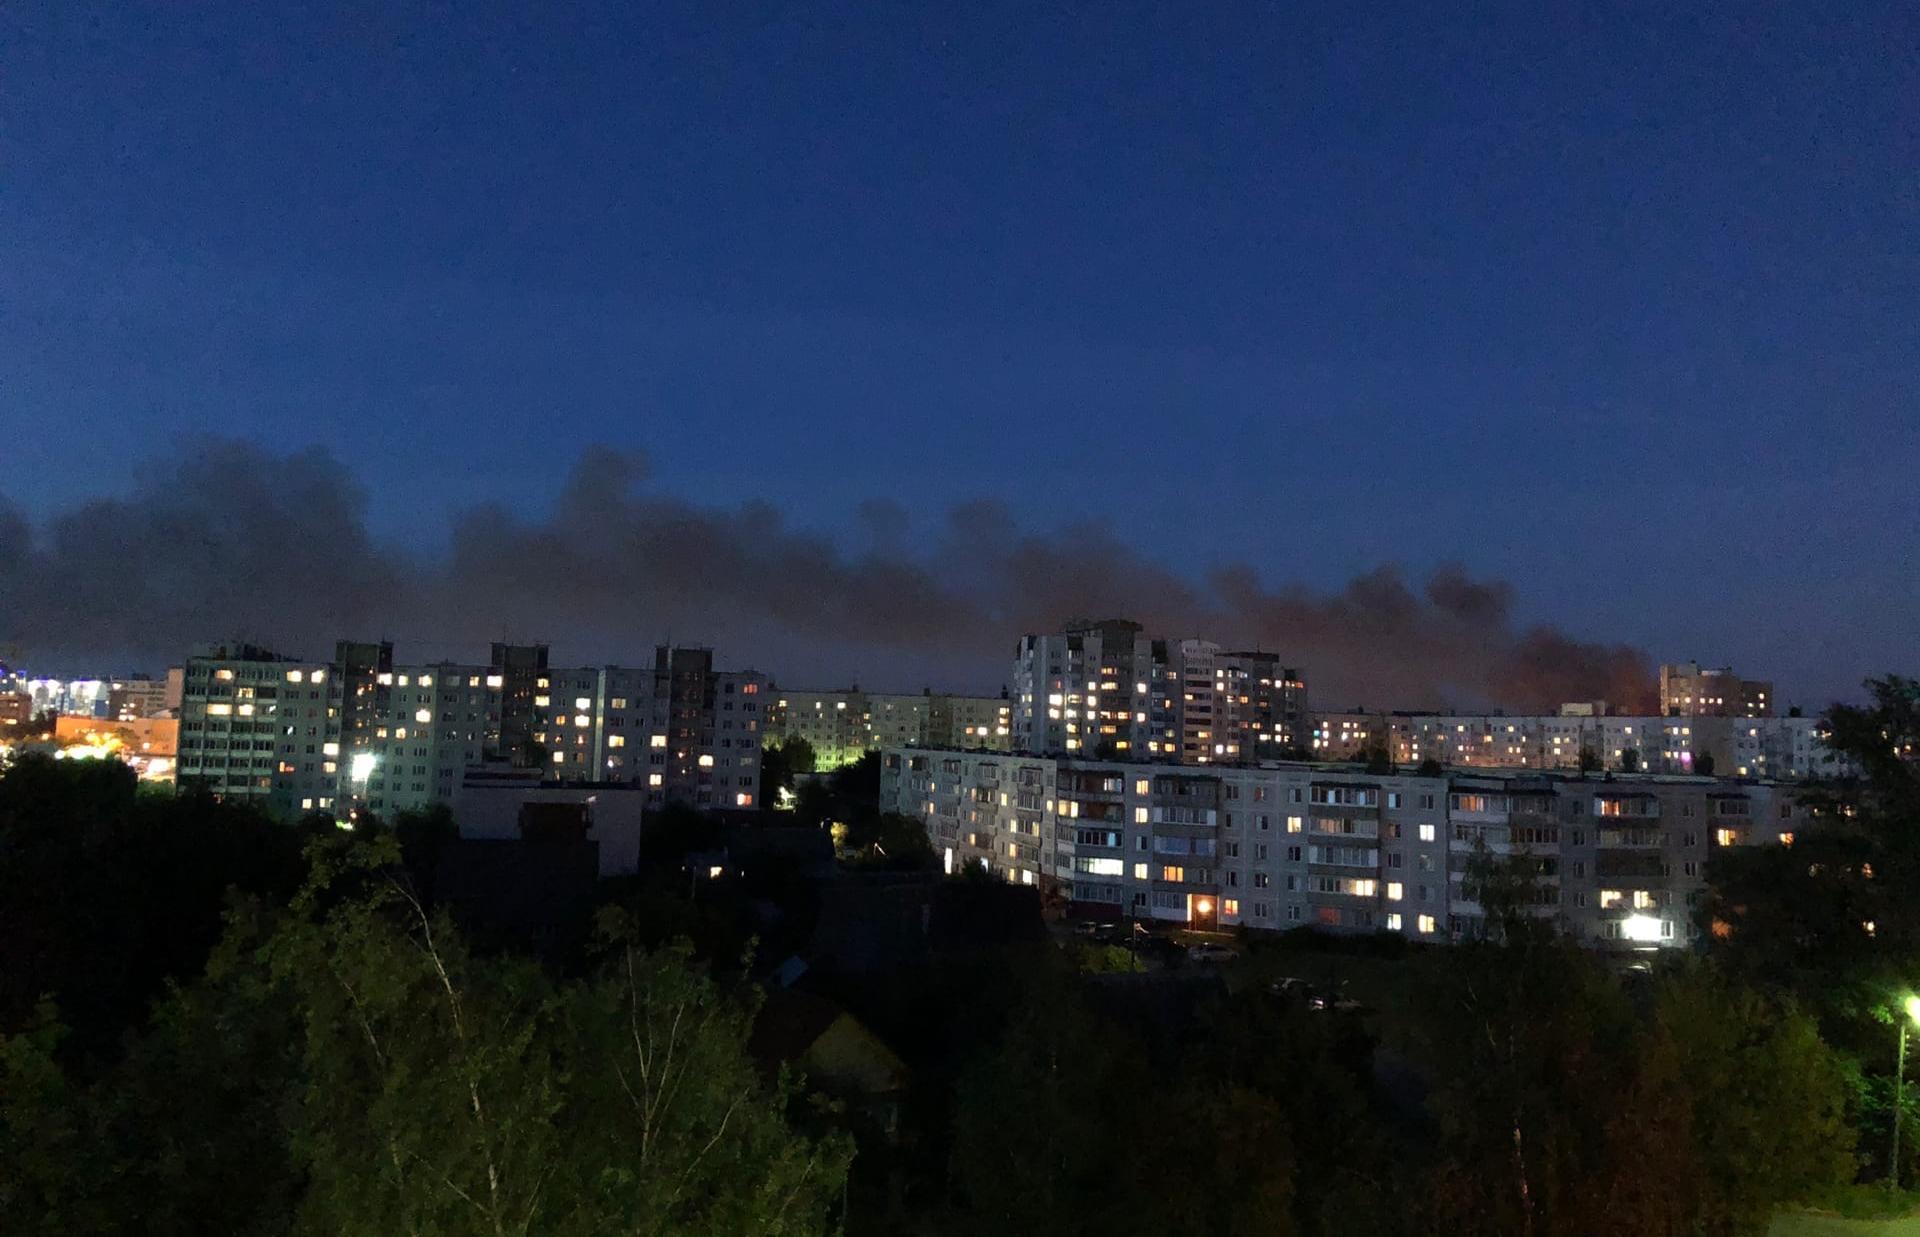 В Твери снова горит заброшенная химбаза - новости Афанасий